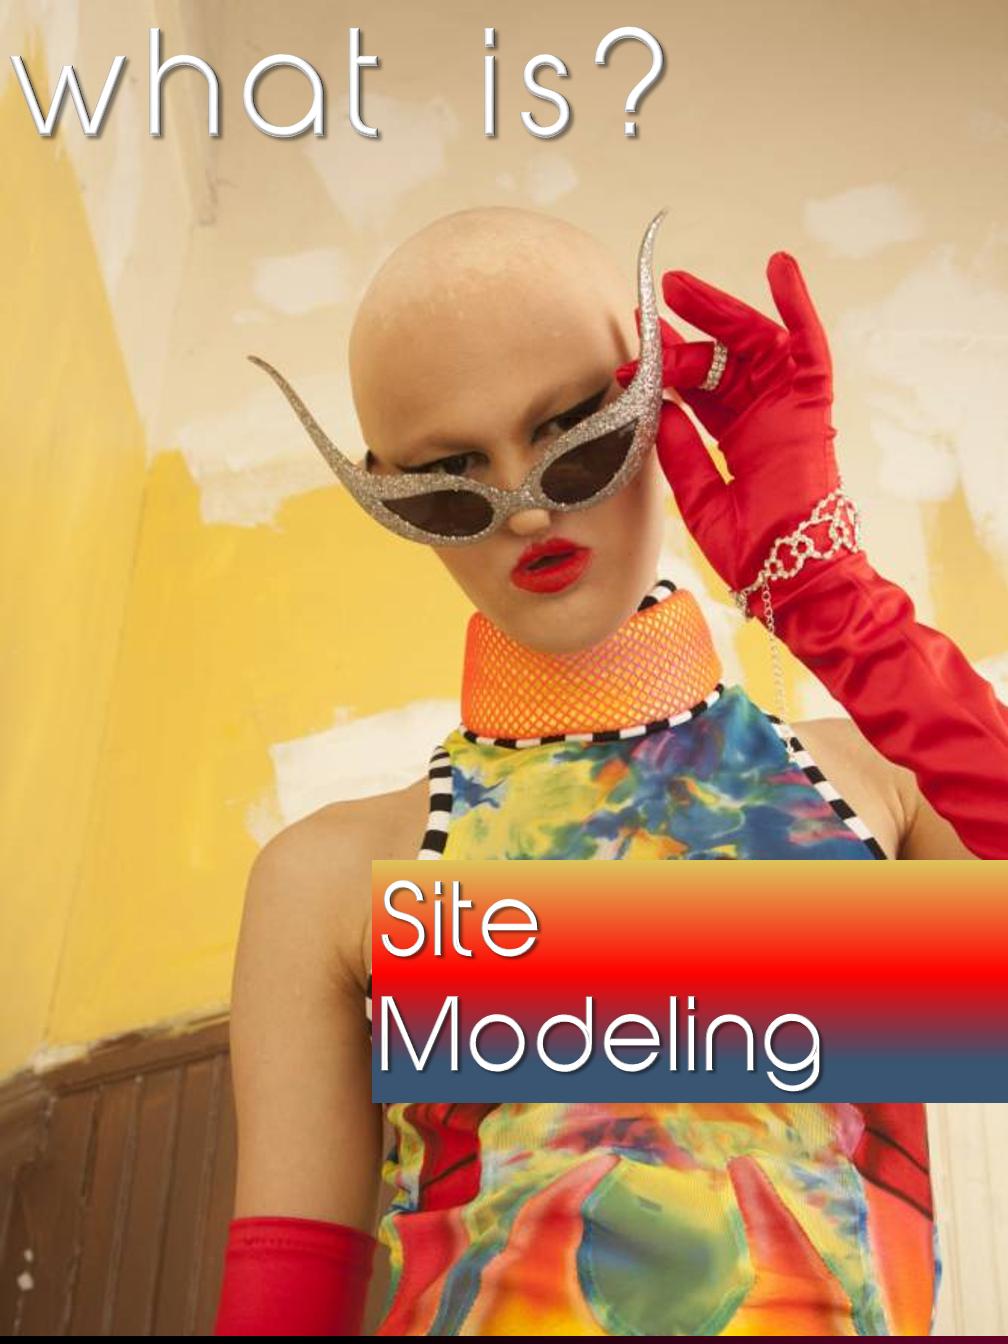 Site Modeling